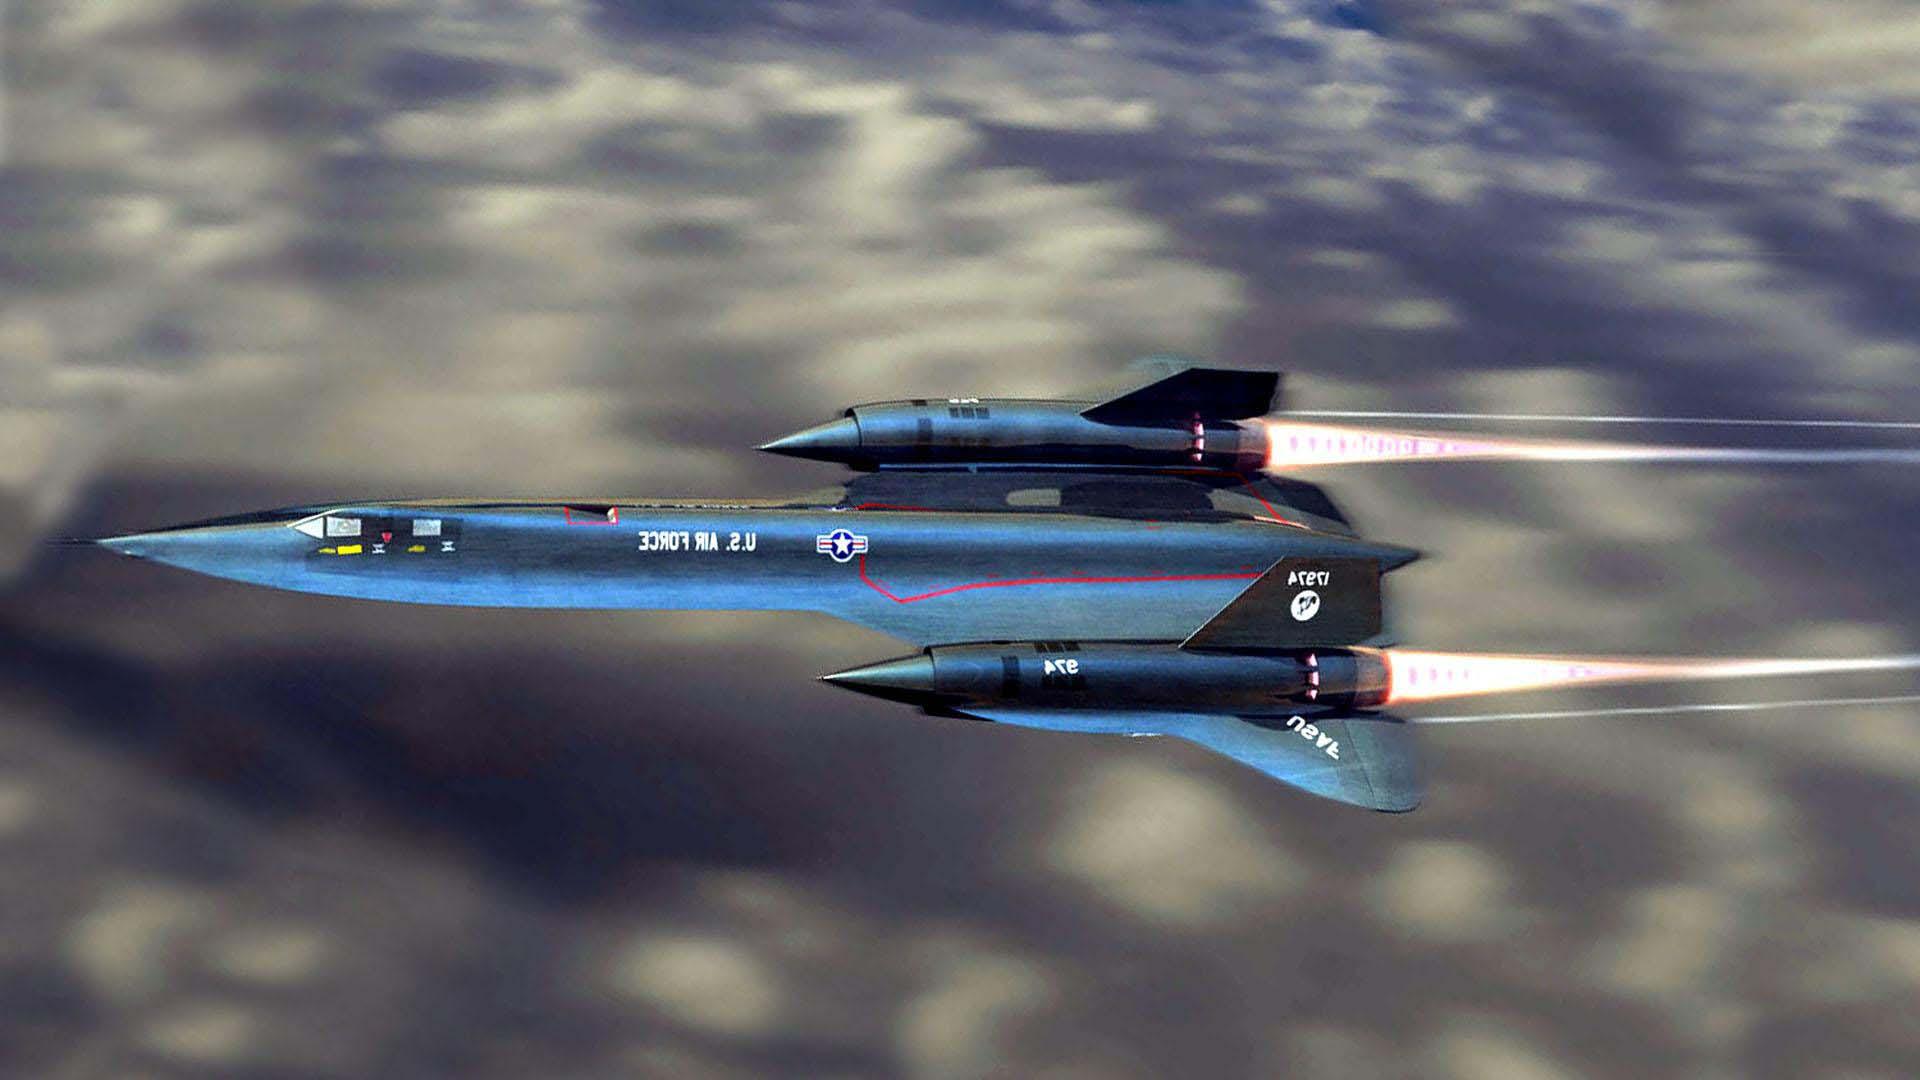 Lockheed Martin Sr 71 Blackbird Wallpaper Retiree News